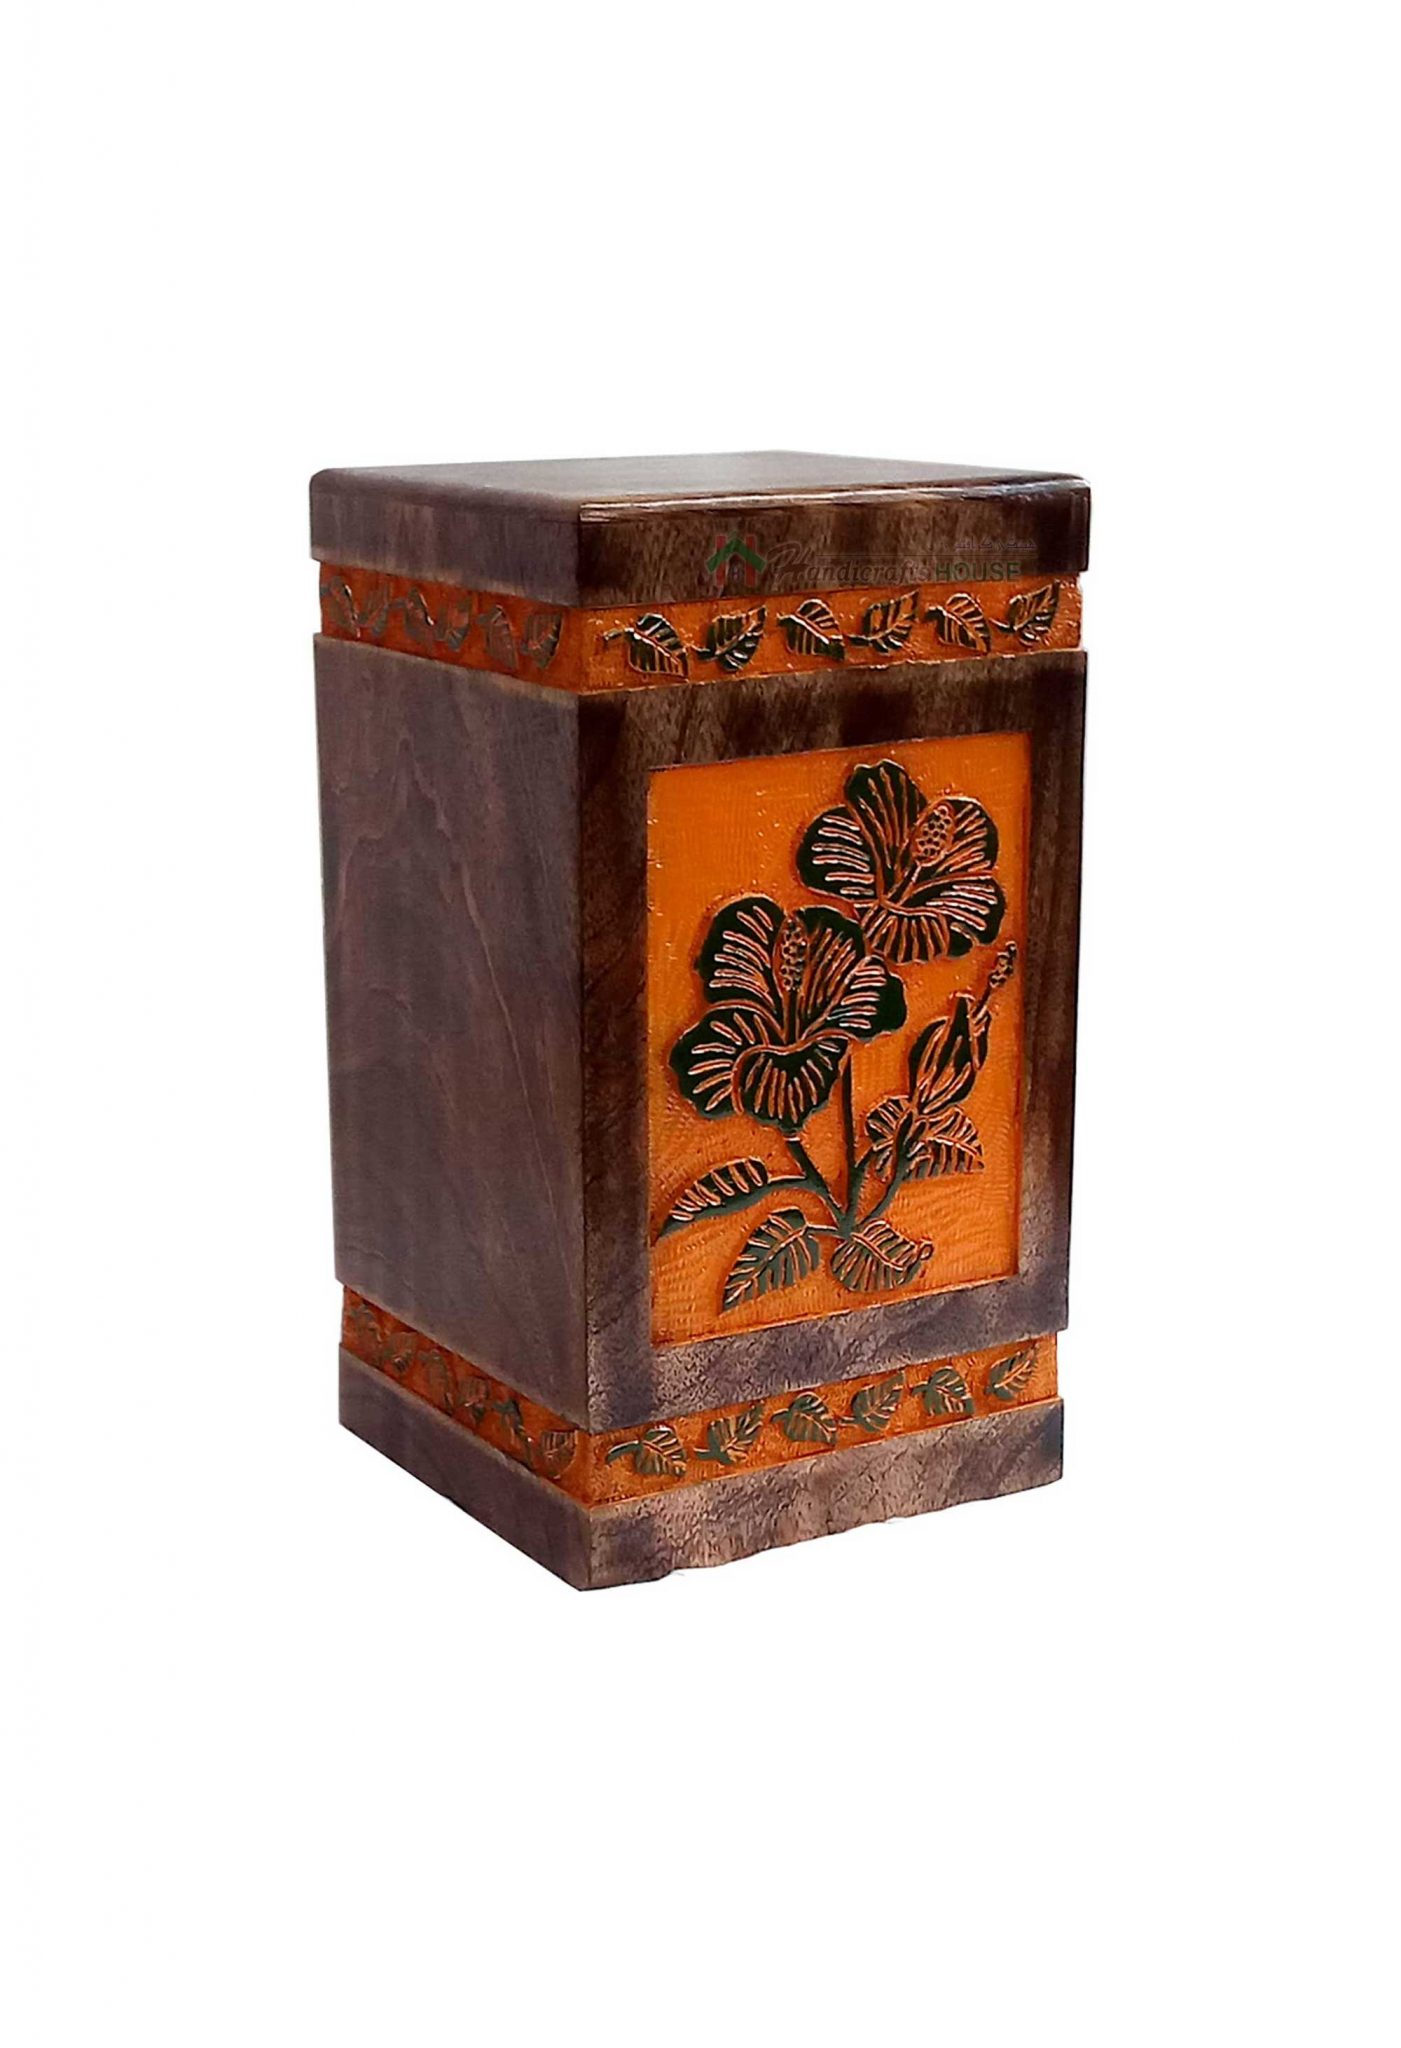 Wood Casket Urn, Memorials Urns For Ashes, Burial Keepsake, Wooden Adult Box